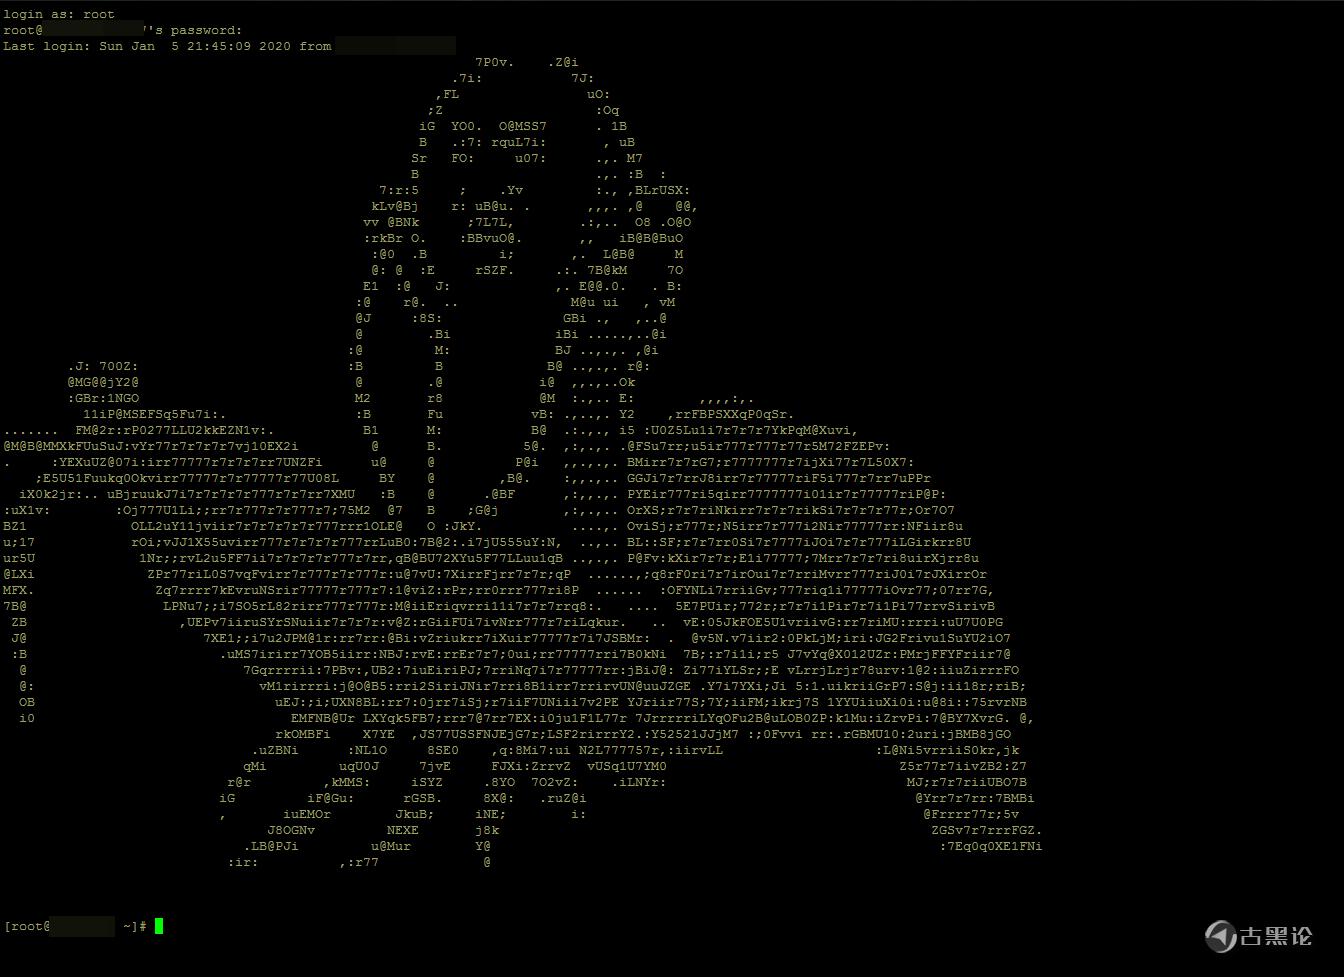 Linux 添加登陆欢迎信息 Img-2.png